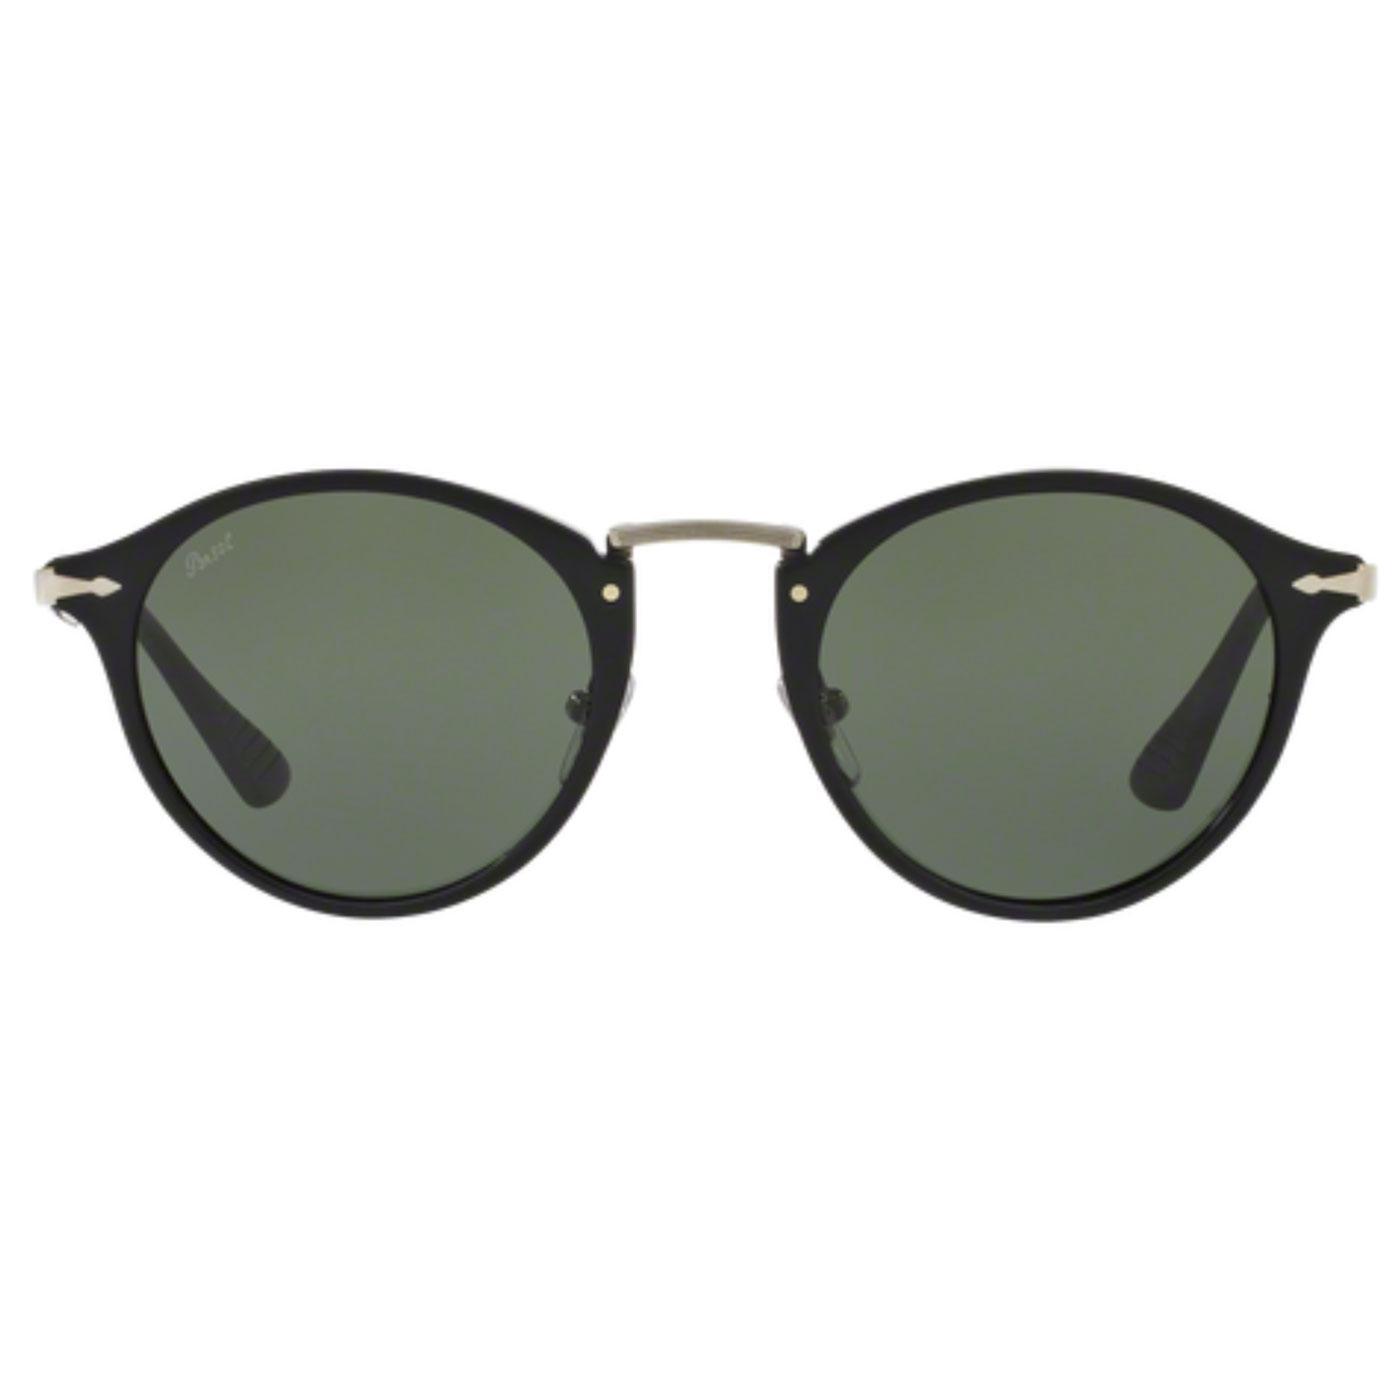 Calligrapher Edition PERSOL Round Sunglasses BLACK